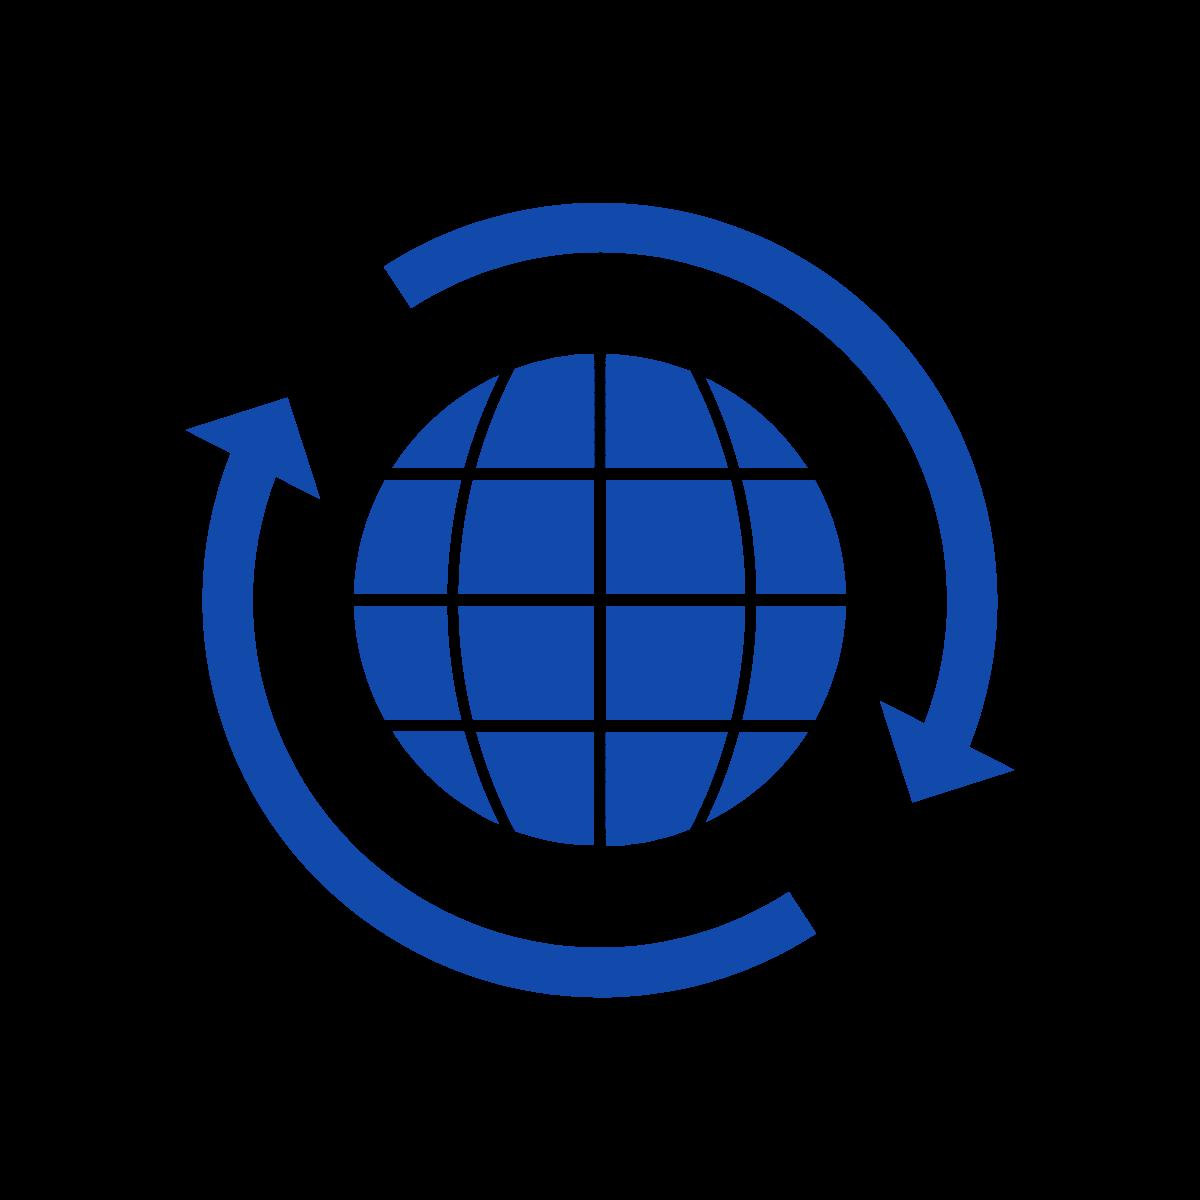 globe with rotating arrows around it